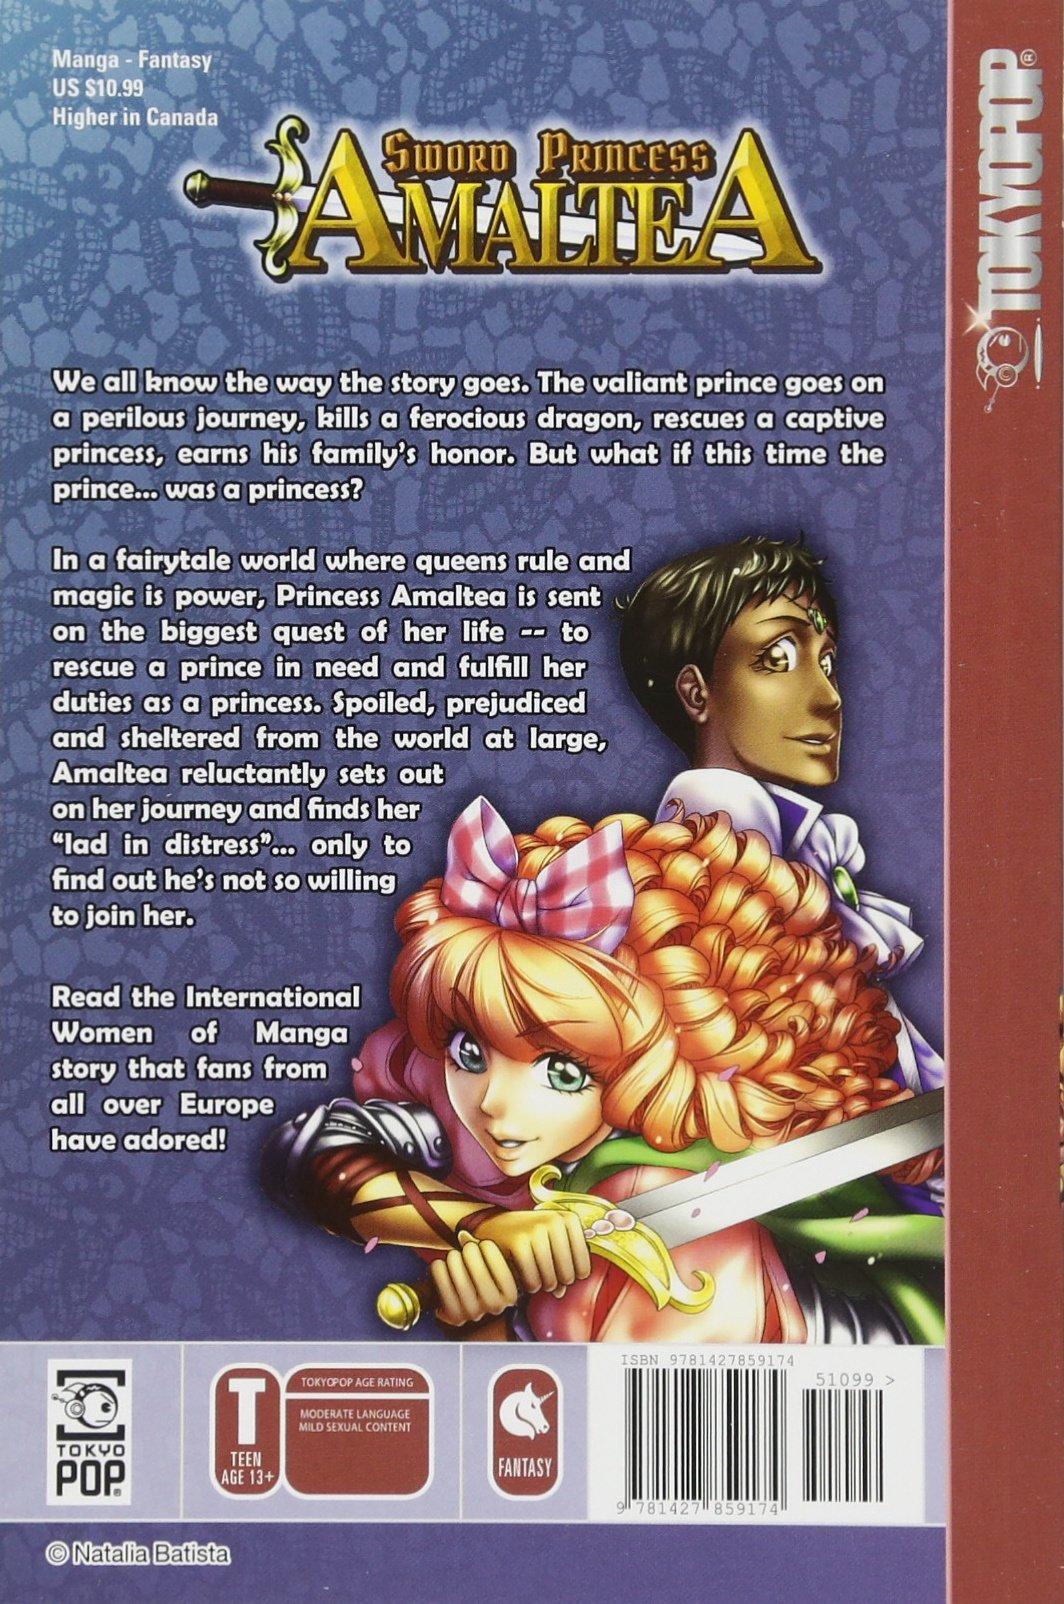 Sword princess amaltea volume 1 manga english livros na amazon sword princess amaltea volume 1 manga english livros na amazon brasil 9781427859174 fandeluxe Images